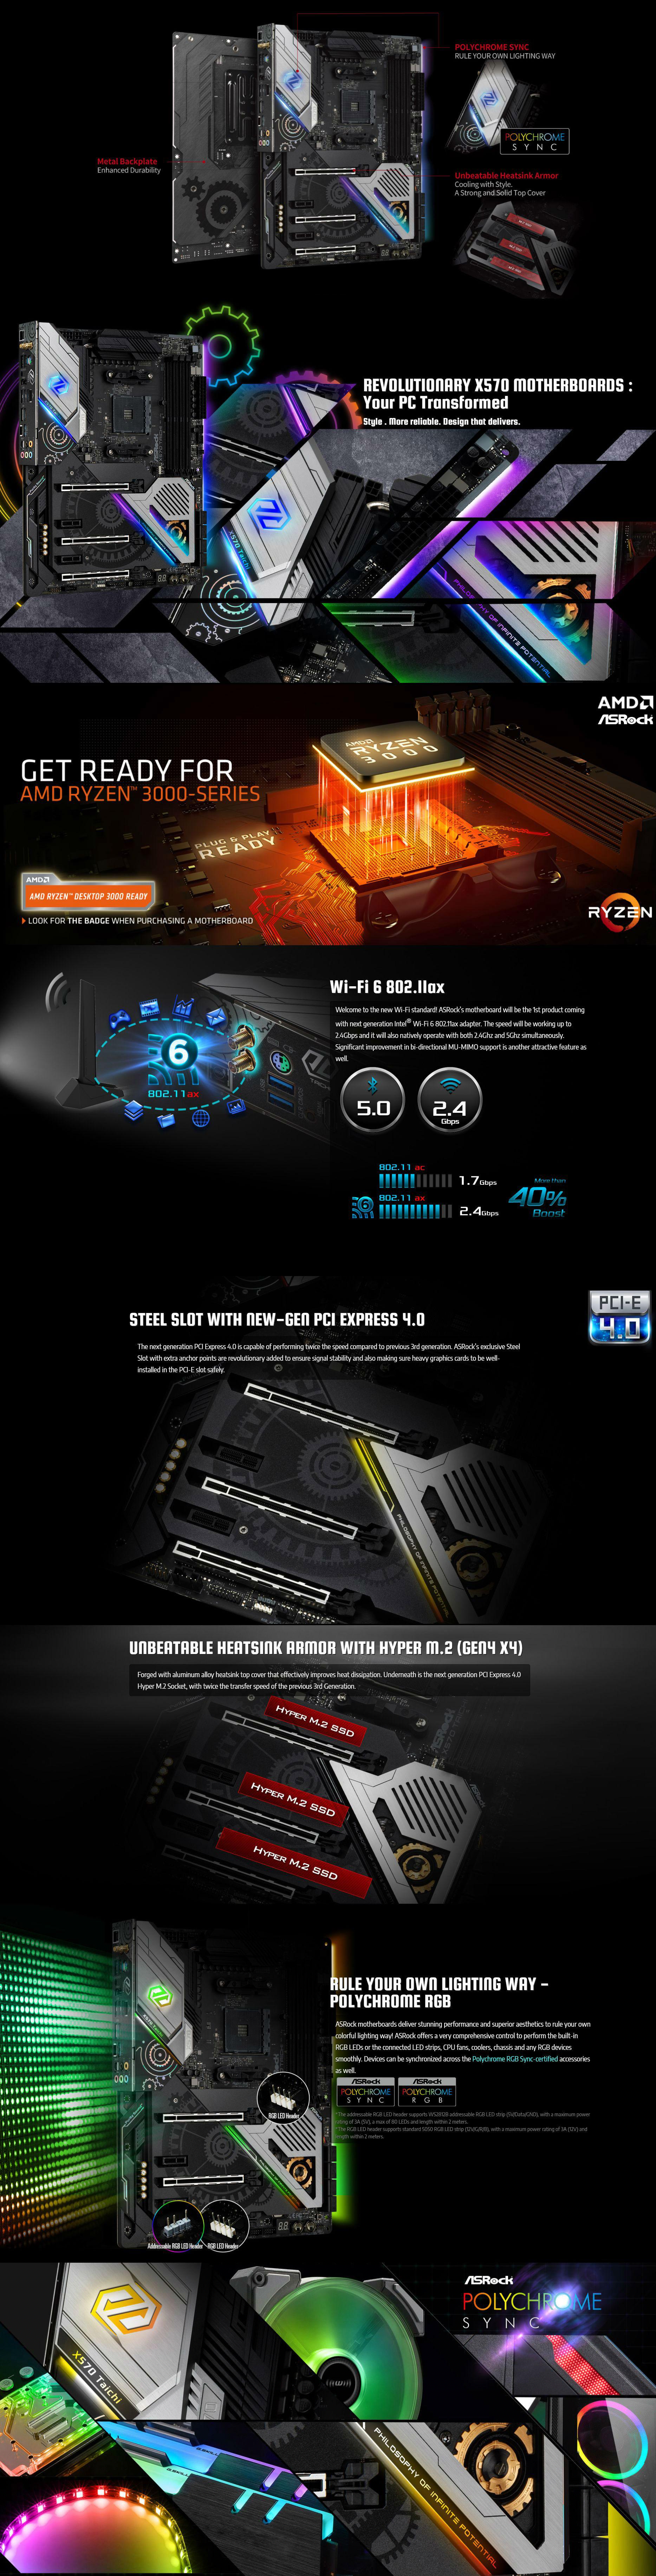 ASRock X570 Taichi AM4 ATX Motherboard